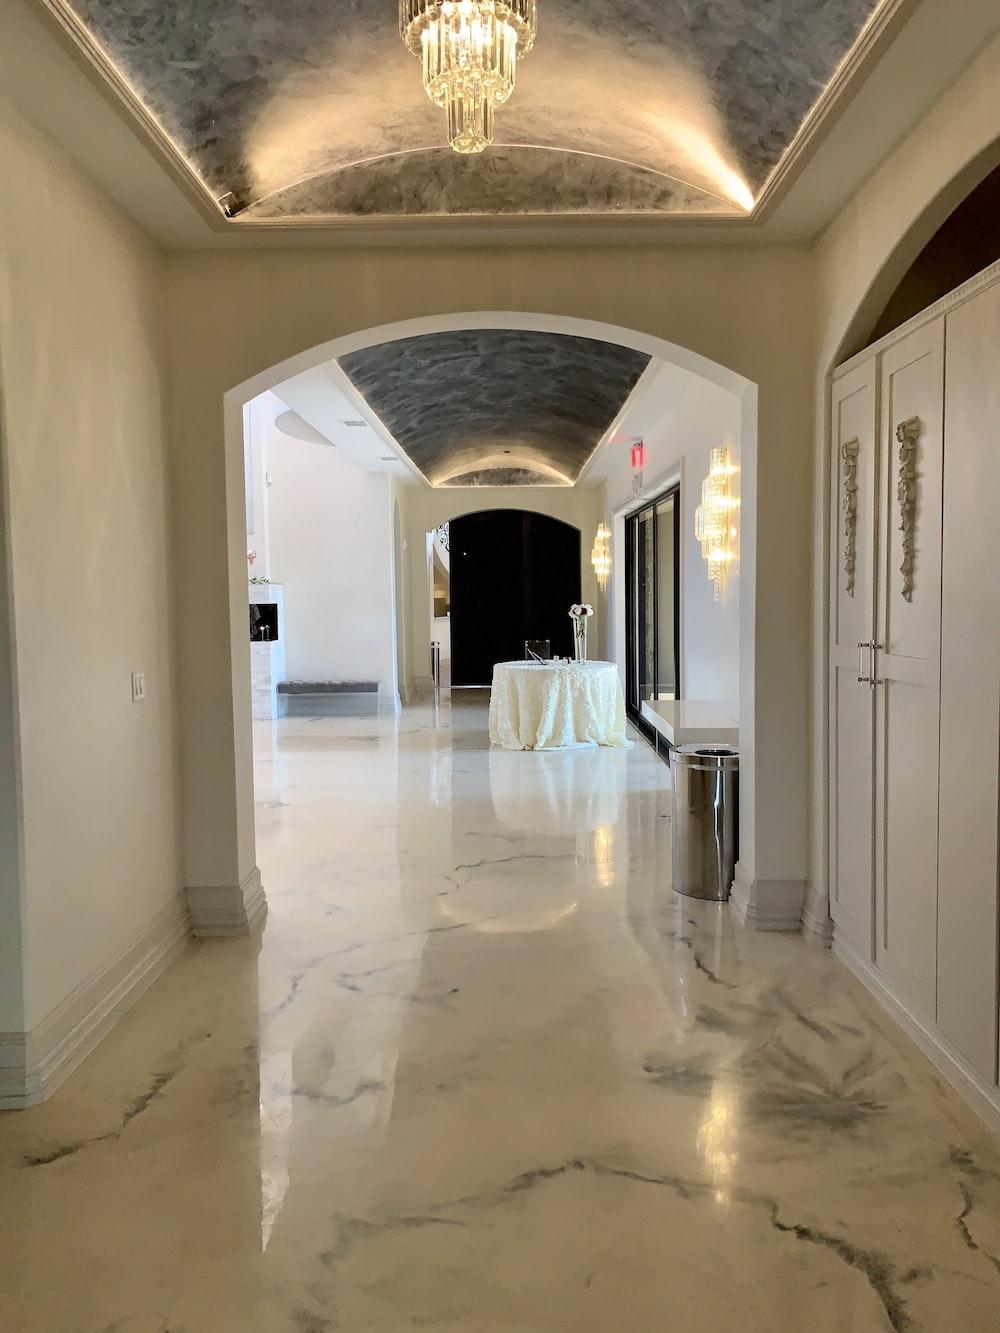 white hallway with white walls